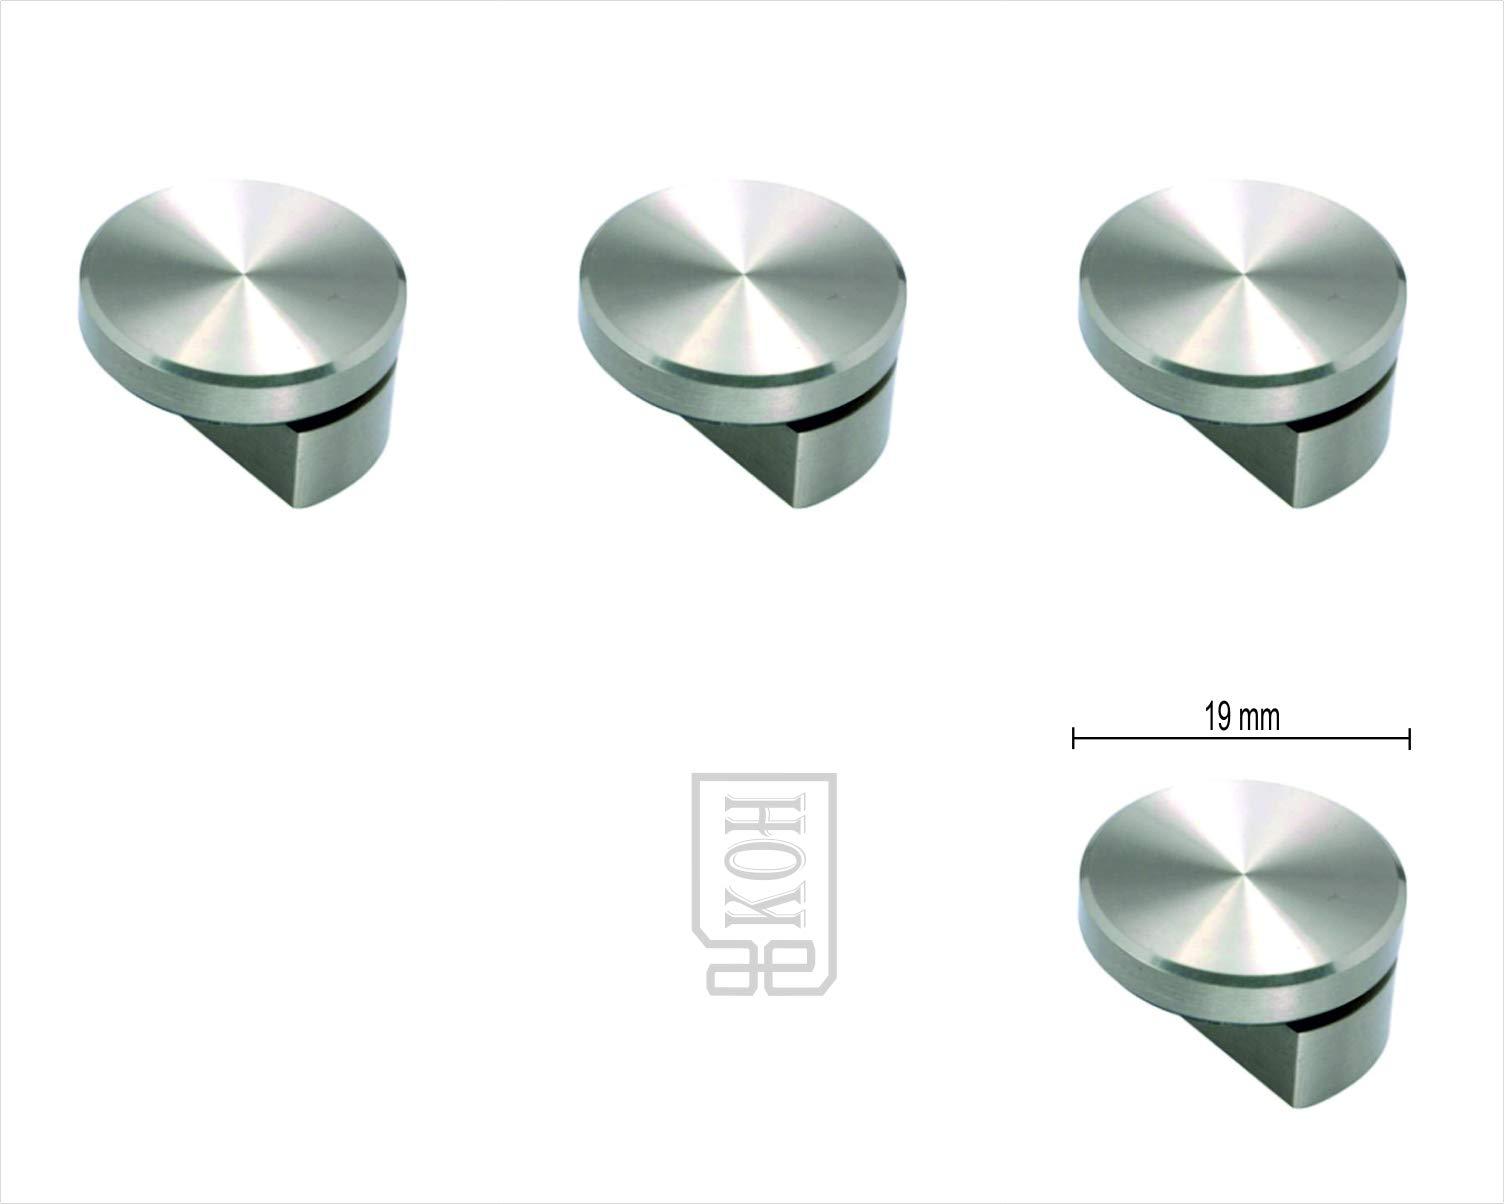 AEKOH 4 X Mirror Holder Bracket Half for 6 mm Glass/Mirrors (19 mm) (B07J1MSFMJ) Amazon Price History, Amazon Price Tracker